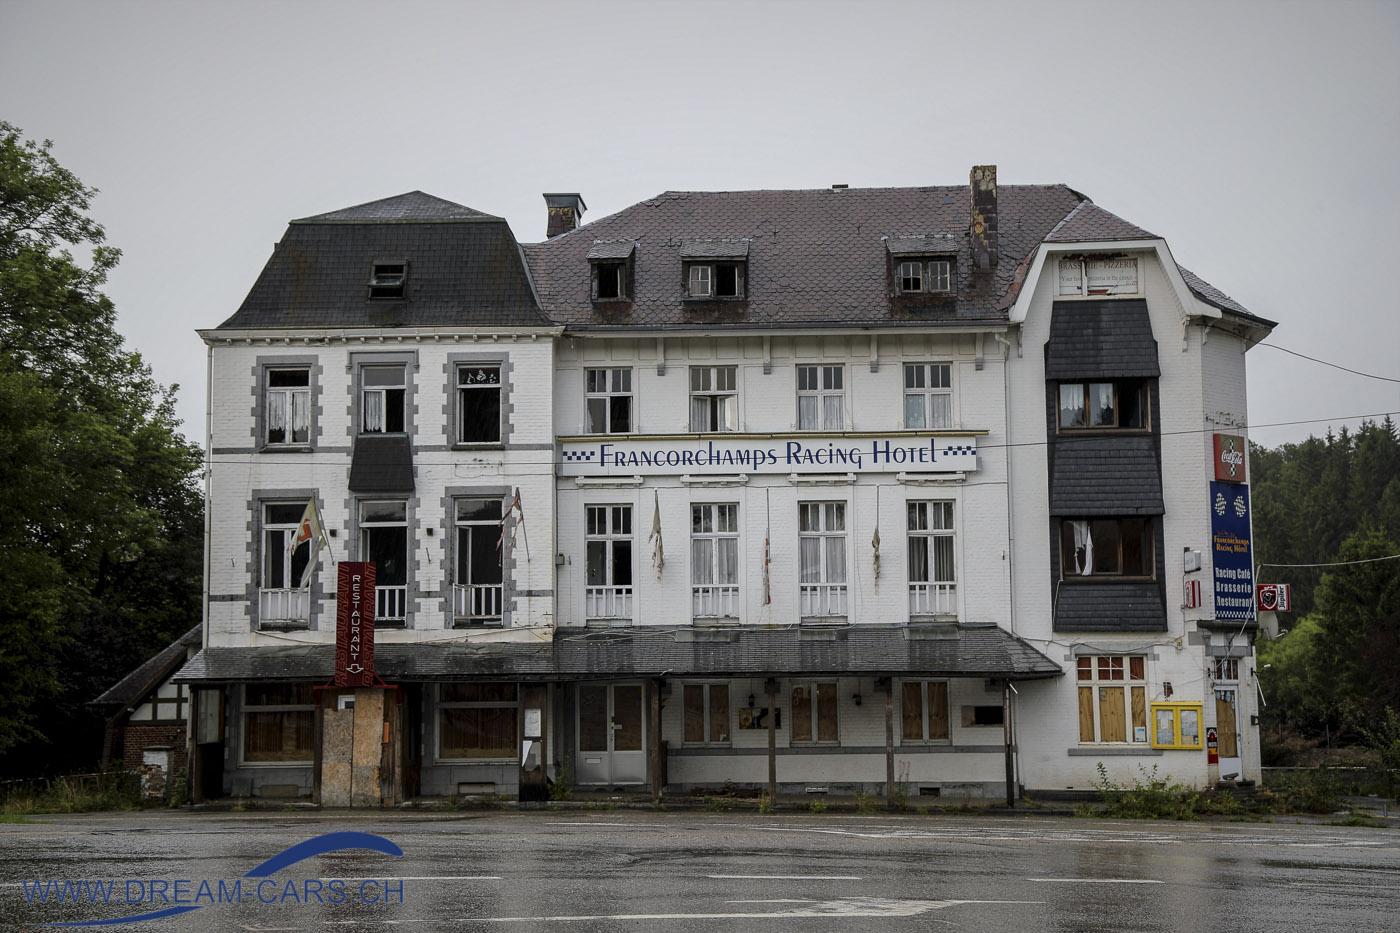 Francorchamps Rading Hotel